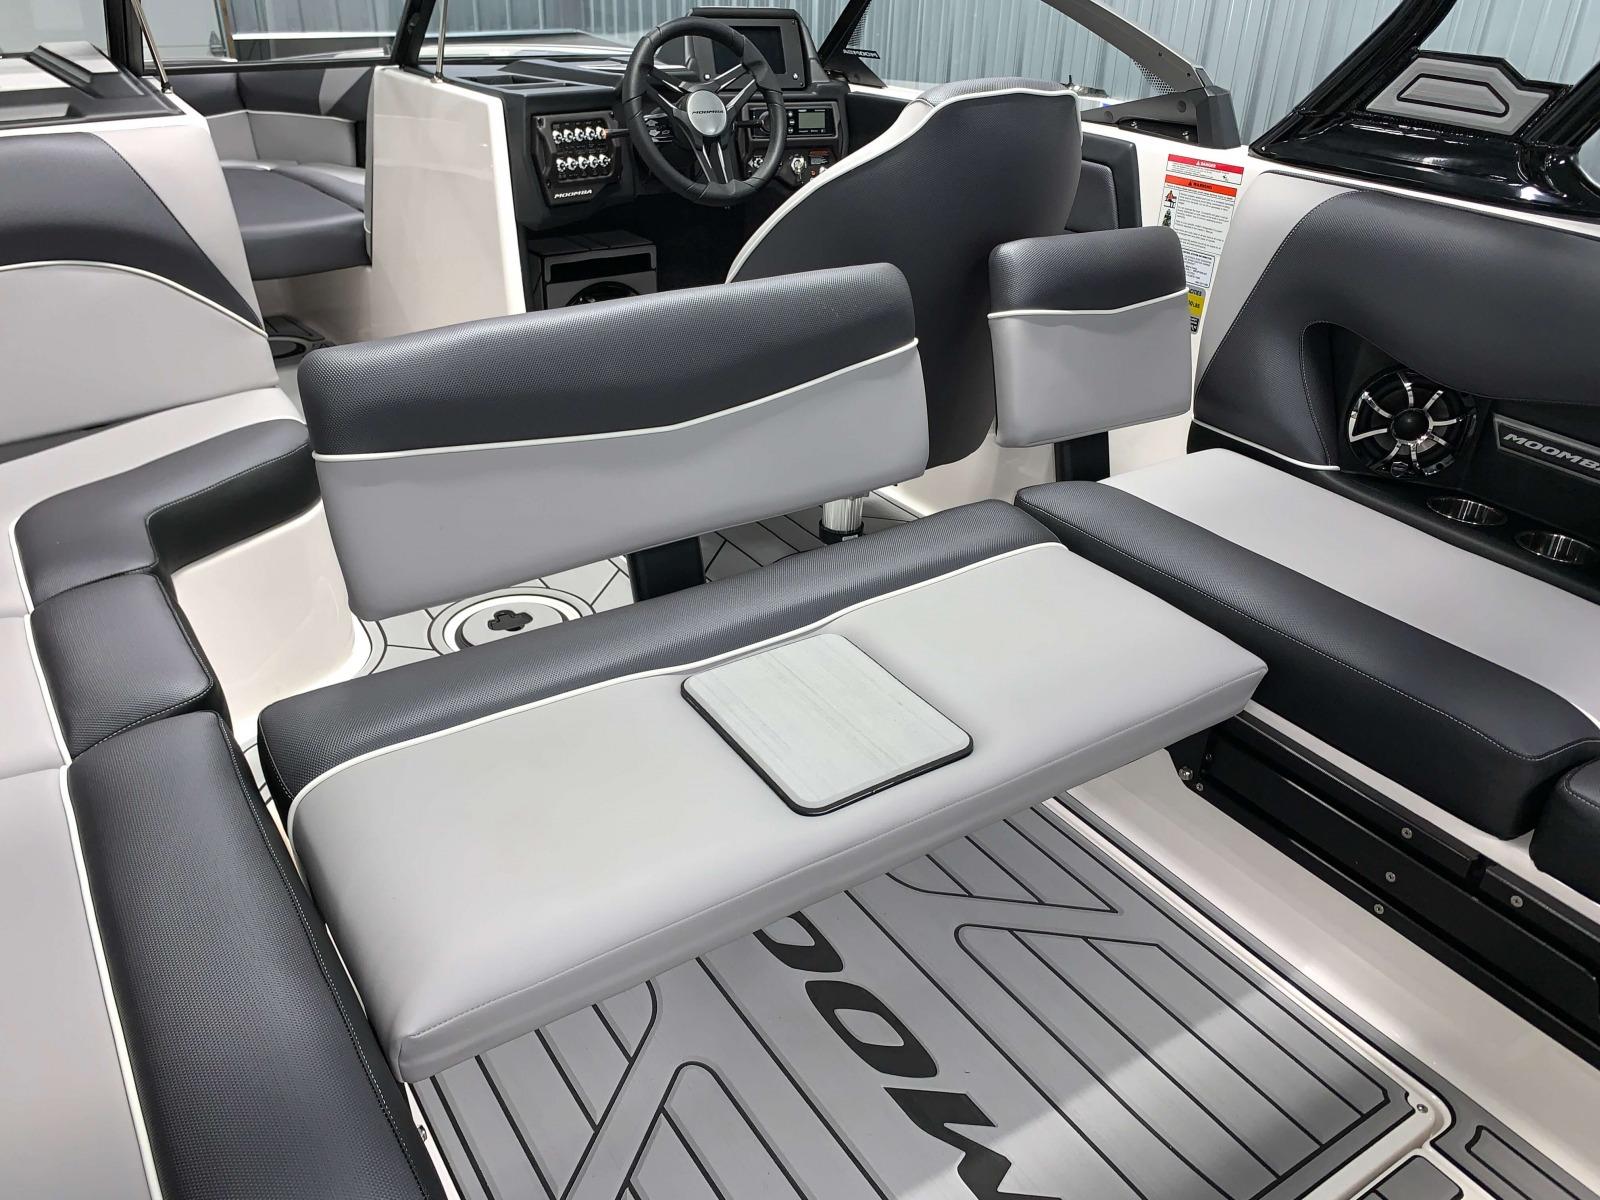 Rear Facing Seat of the 2021 Moomba Craz Wake Boat